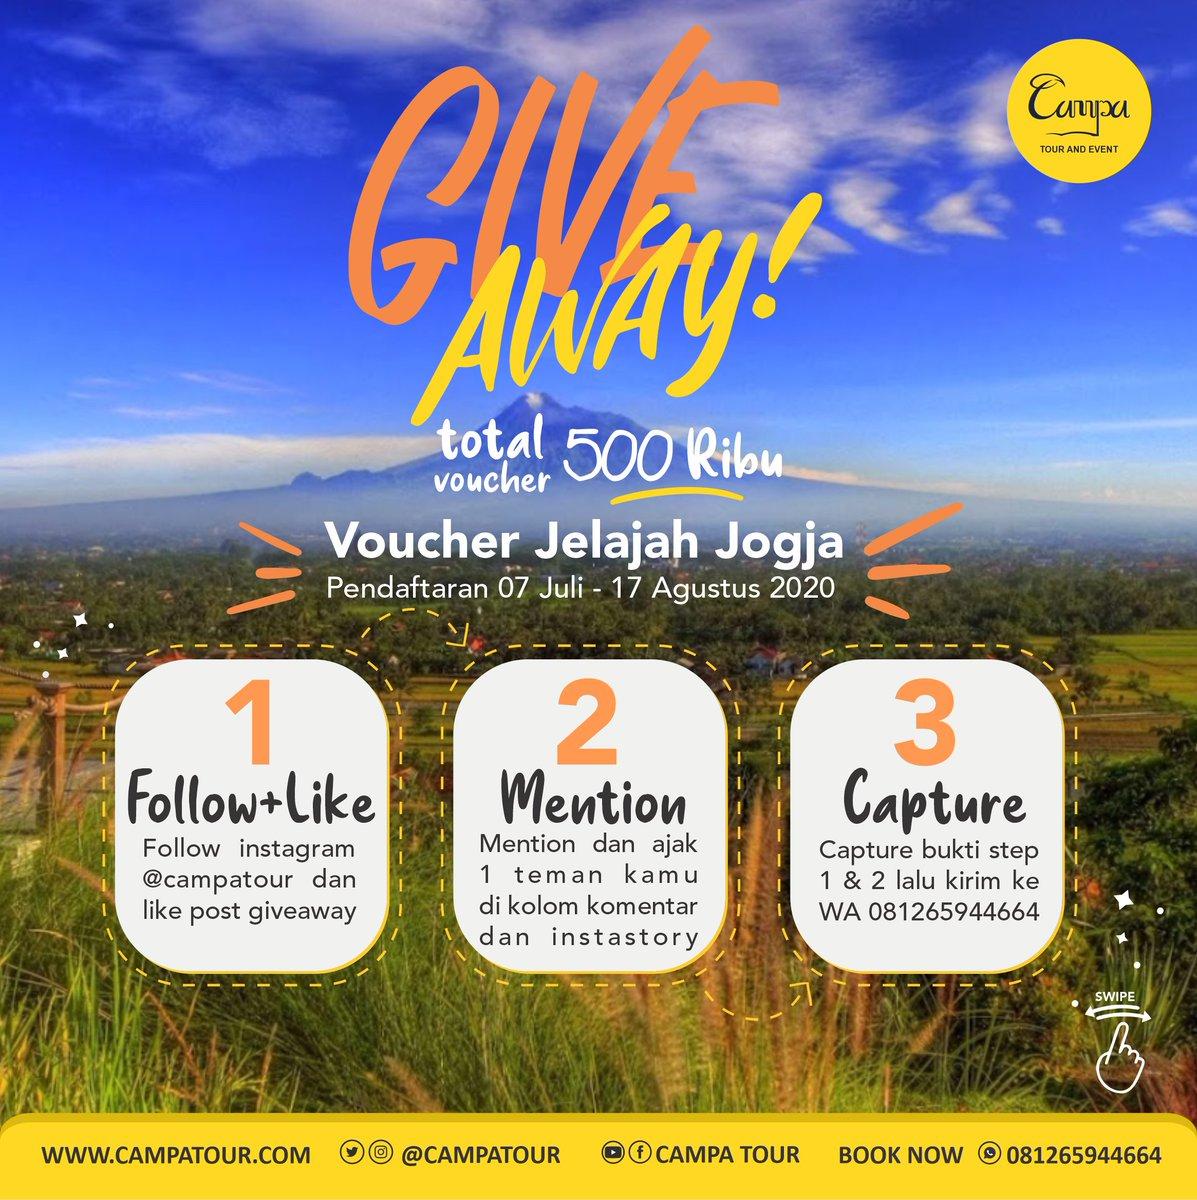 GIVEAWAY ALERT JELAJAH JOGJA TOTAL HADIAH VOUCHER IDR 500K MASA BERLAKU SATU TAHUN!   #GIVEAWAY #jogja #explorejogja #pesonajogja #pesonaindonesia #wonderfulindonesia #wonderfuljogja #exploreindonesia #merapi #borobudur #prambanan #thisisCHAN #FirstSoloistV #OVOquizpic.twitter.com/tKgU7XKigq